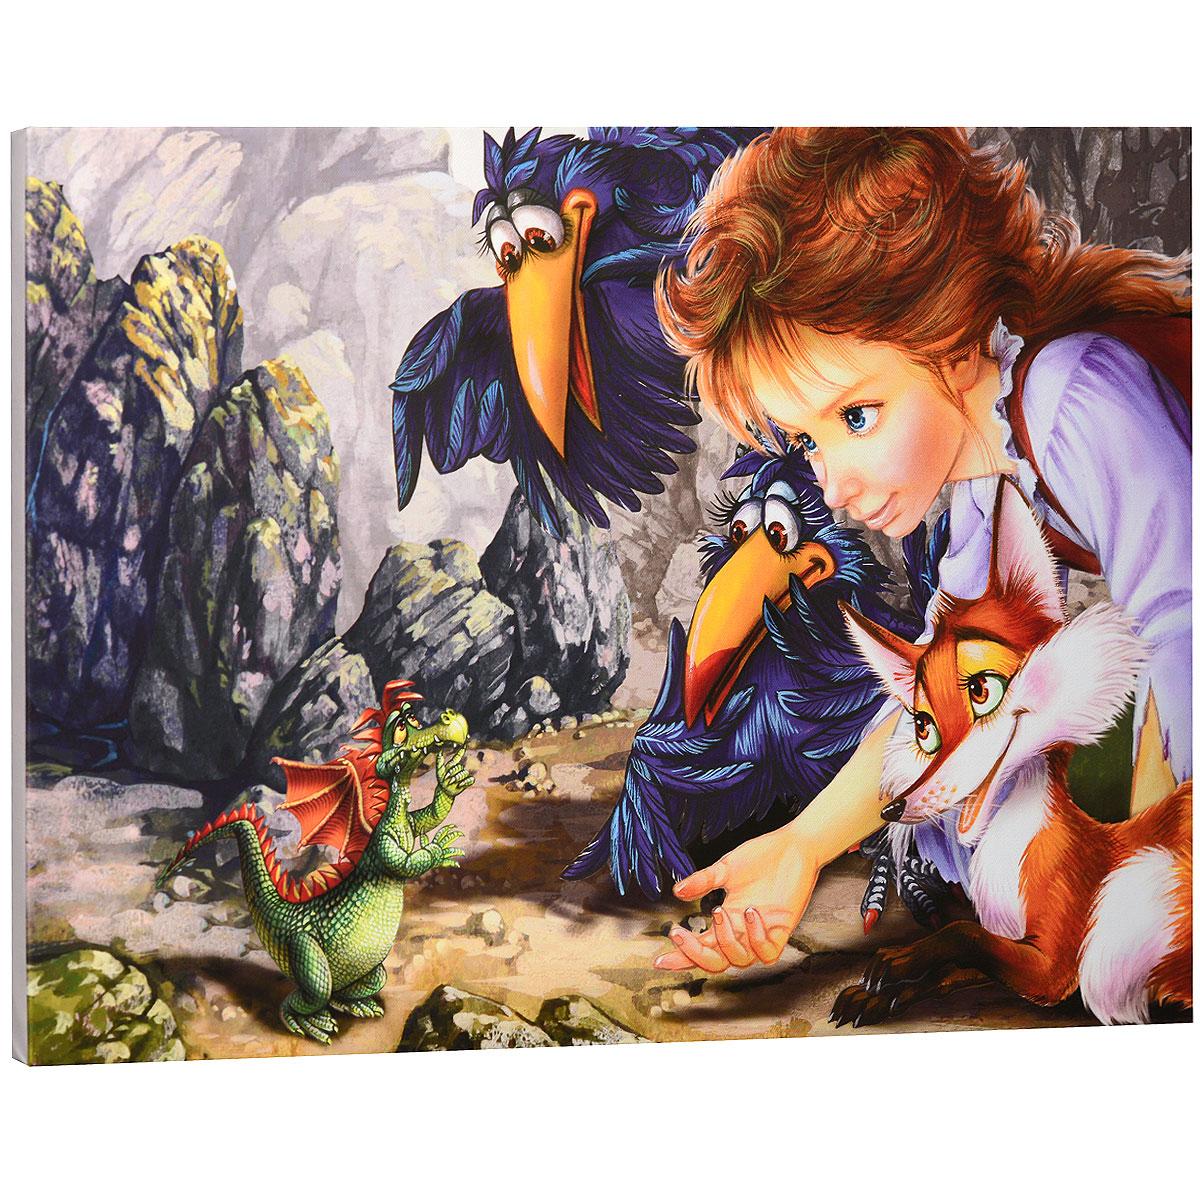 КвикДекор Картина на холсте  Разговор с дракончиком , 60 см х 40 см -  Детская комната